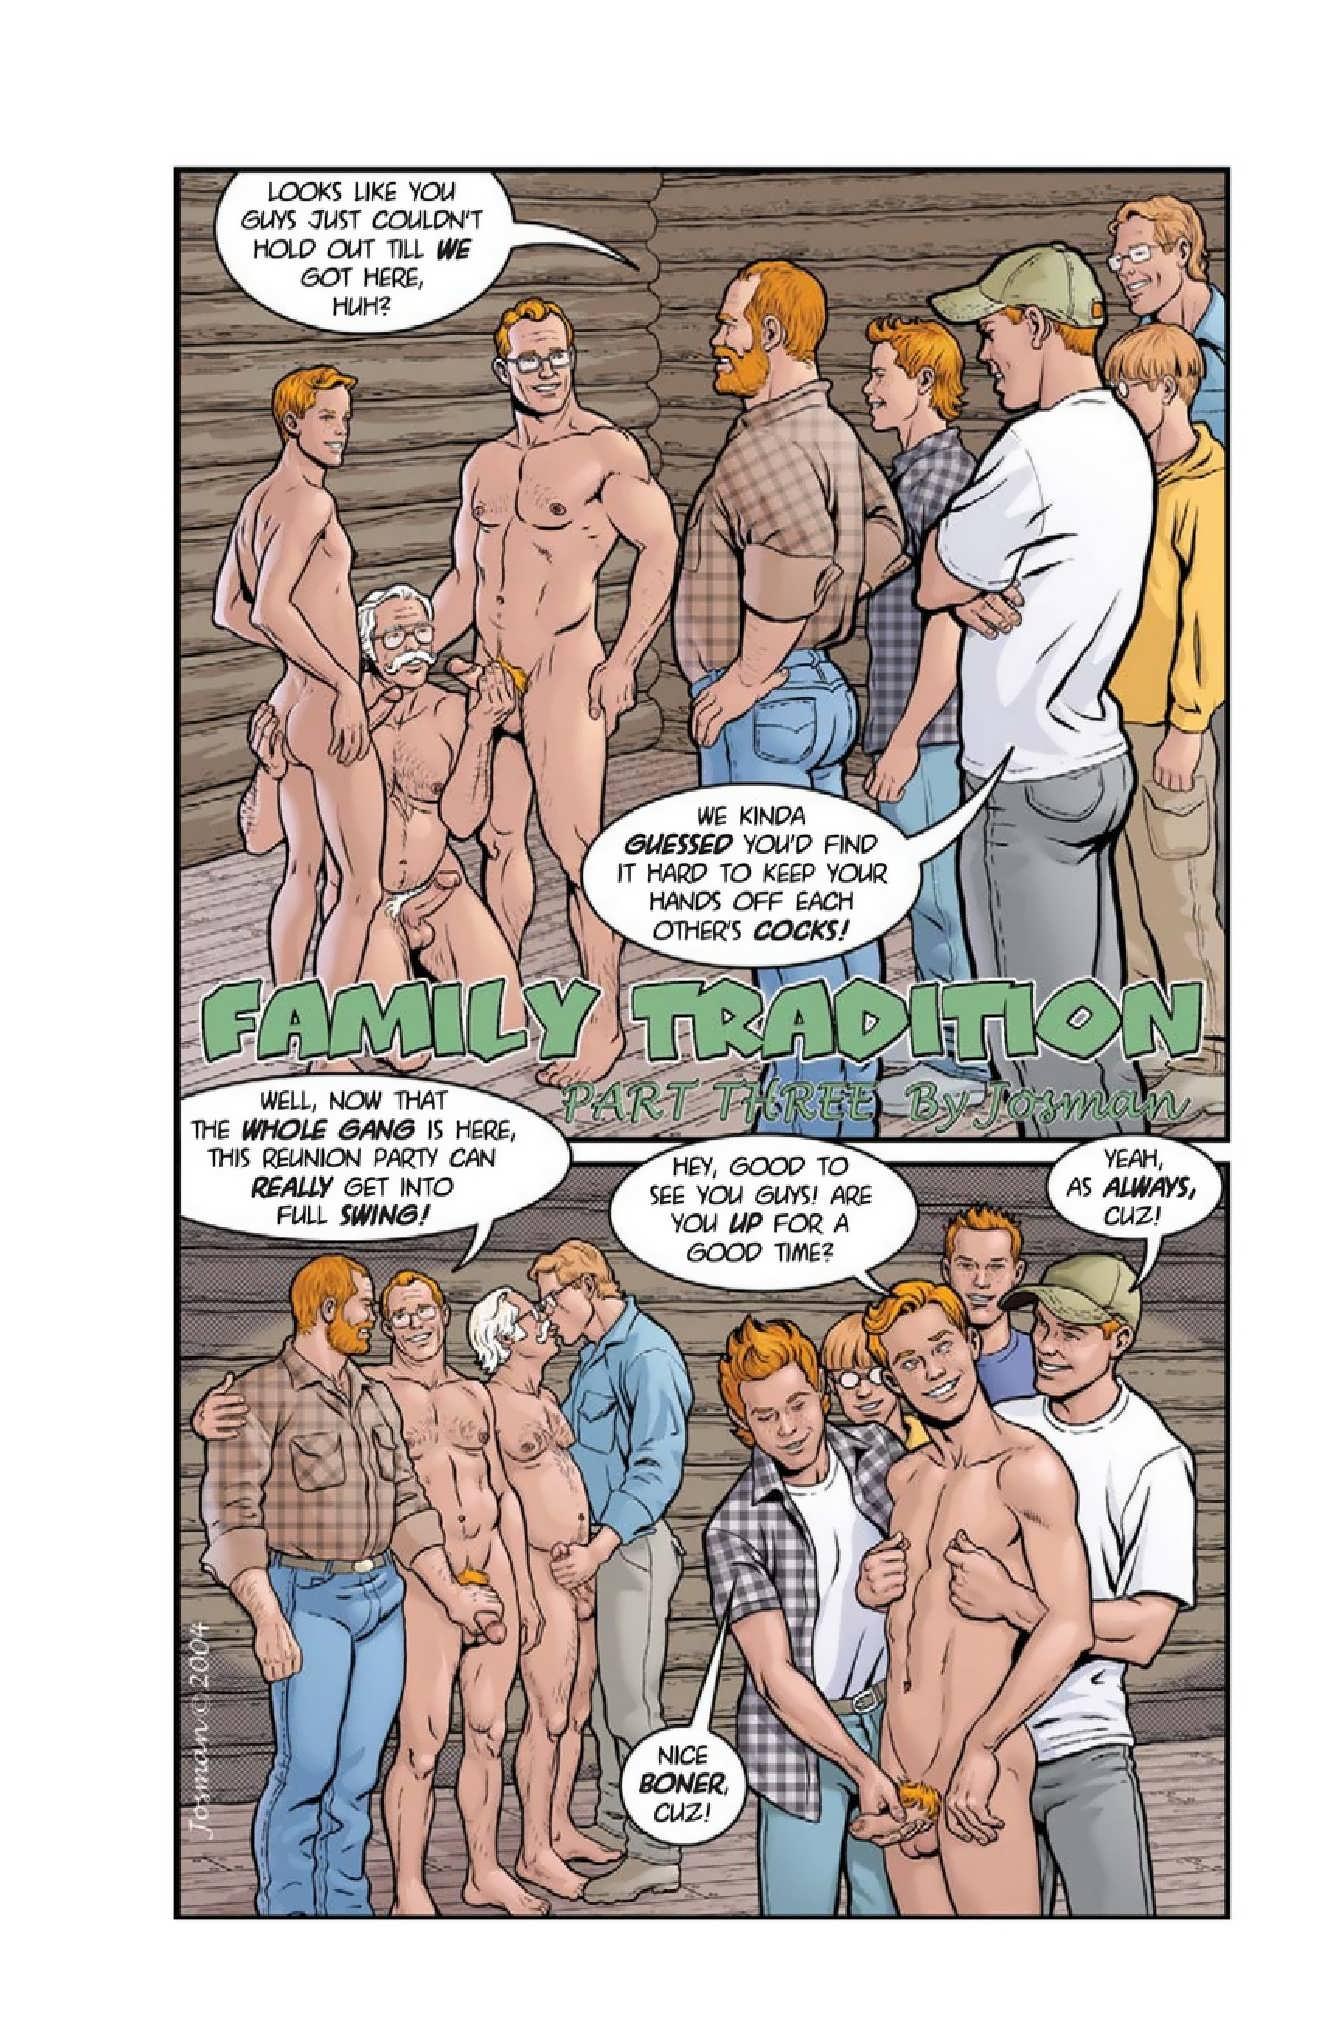 Bandes dessinées gay yaoi